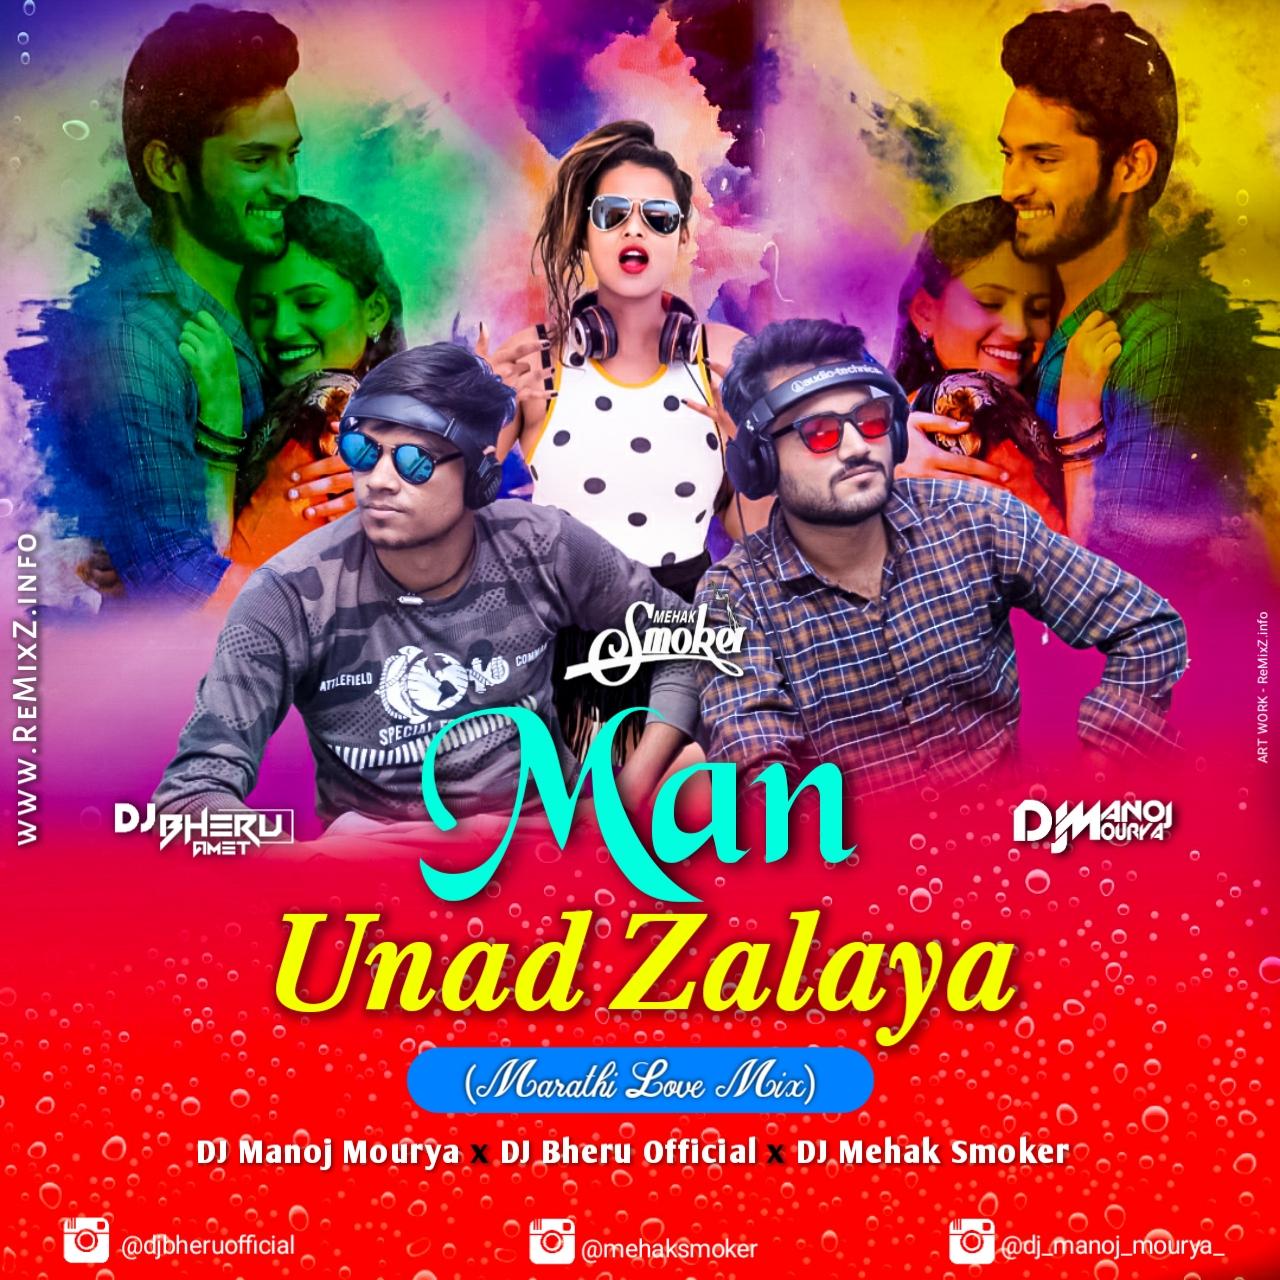 man-unad-zalaya-marathi-love-mix.jpg